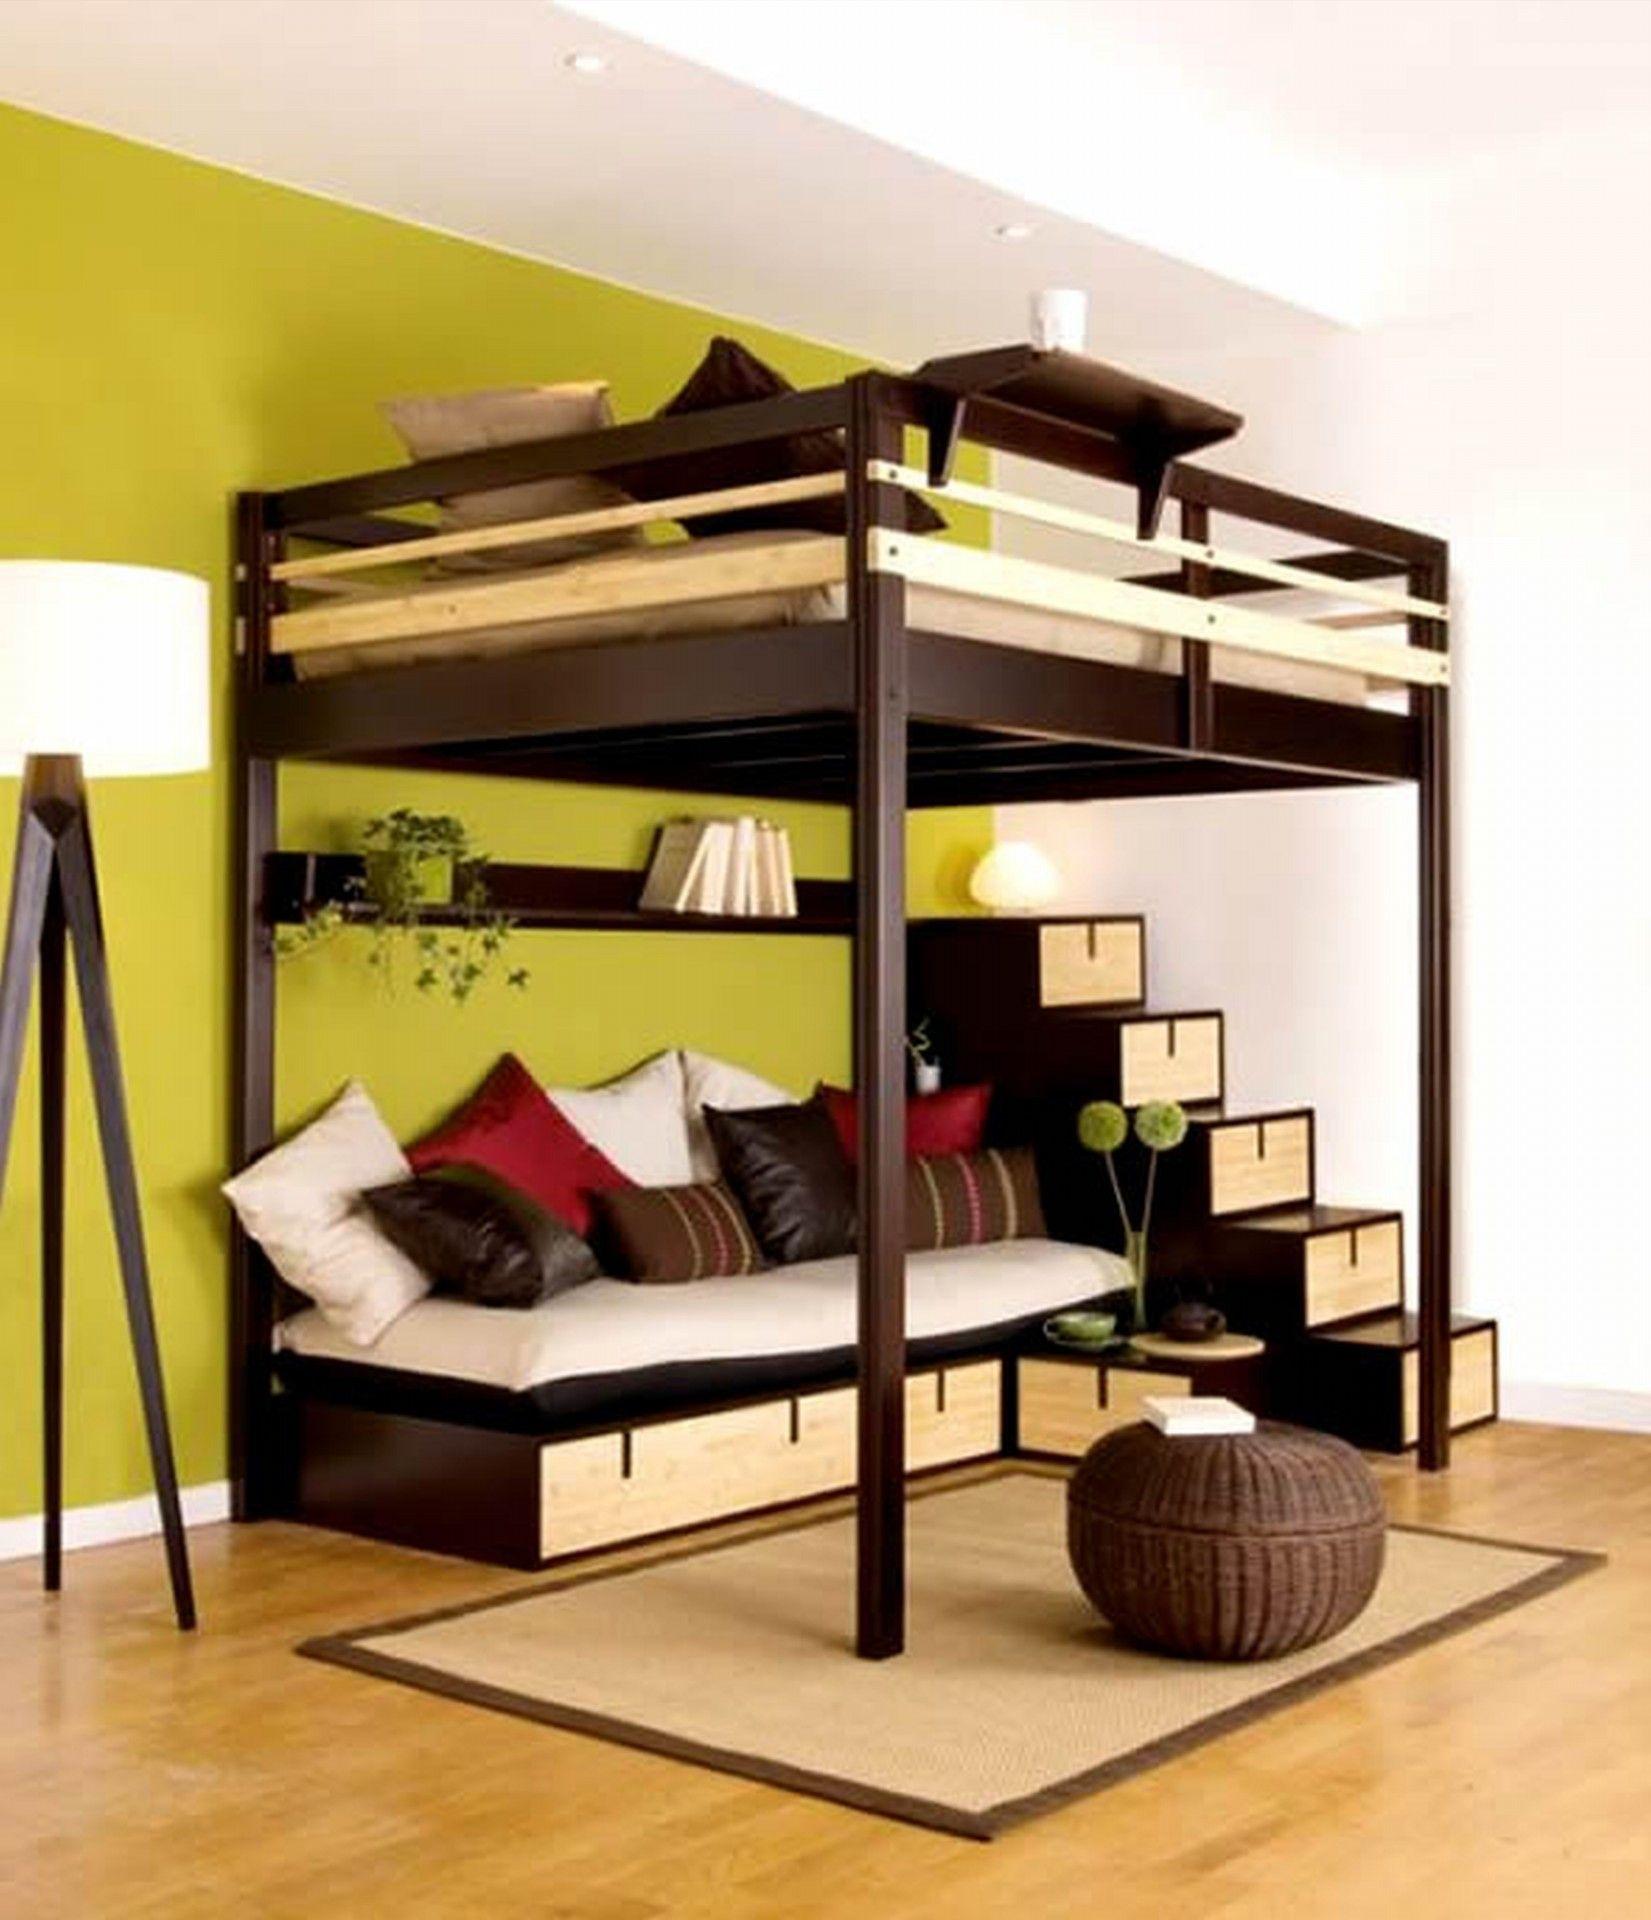 Loft bed curtain ideas  Modern Minimalist Boy Bedroom Idea With Espresso Wood Loft Bed With